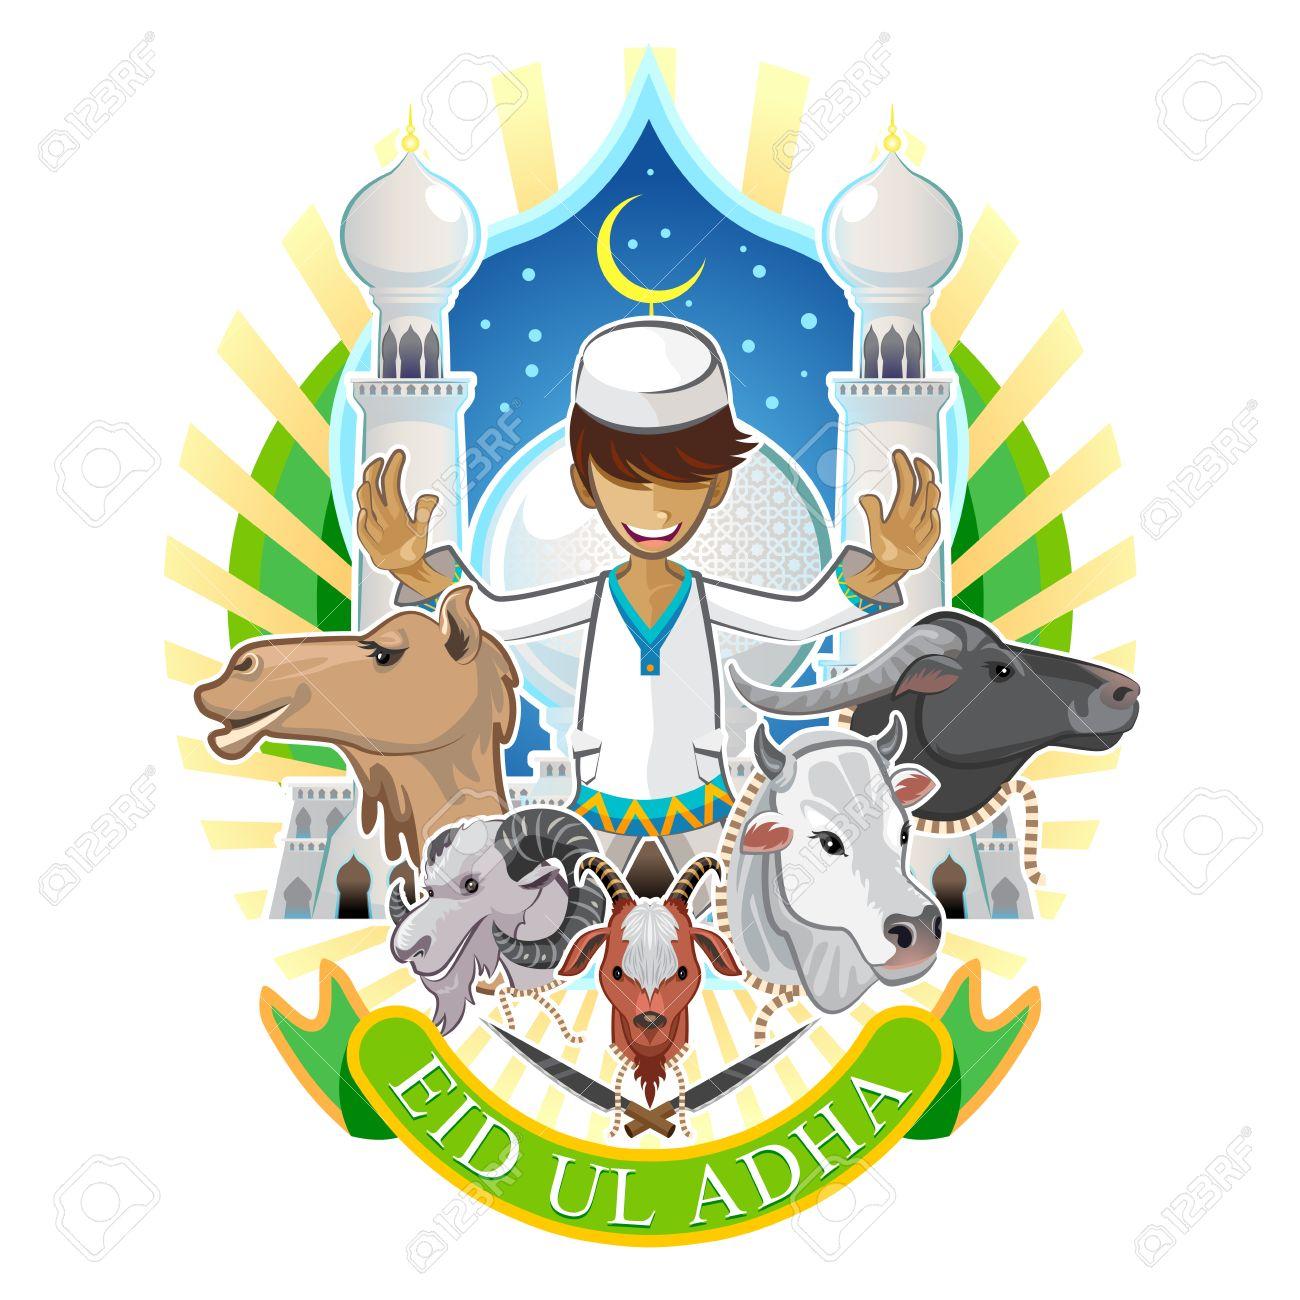 Eid Al Adha Greeting Card Celebration Of Festival Of Sacrifice Islam Religious Holiday - 44098563